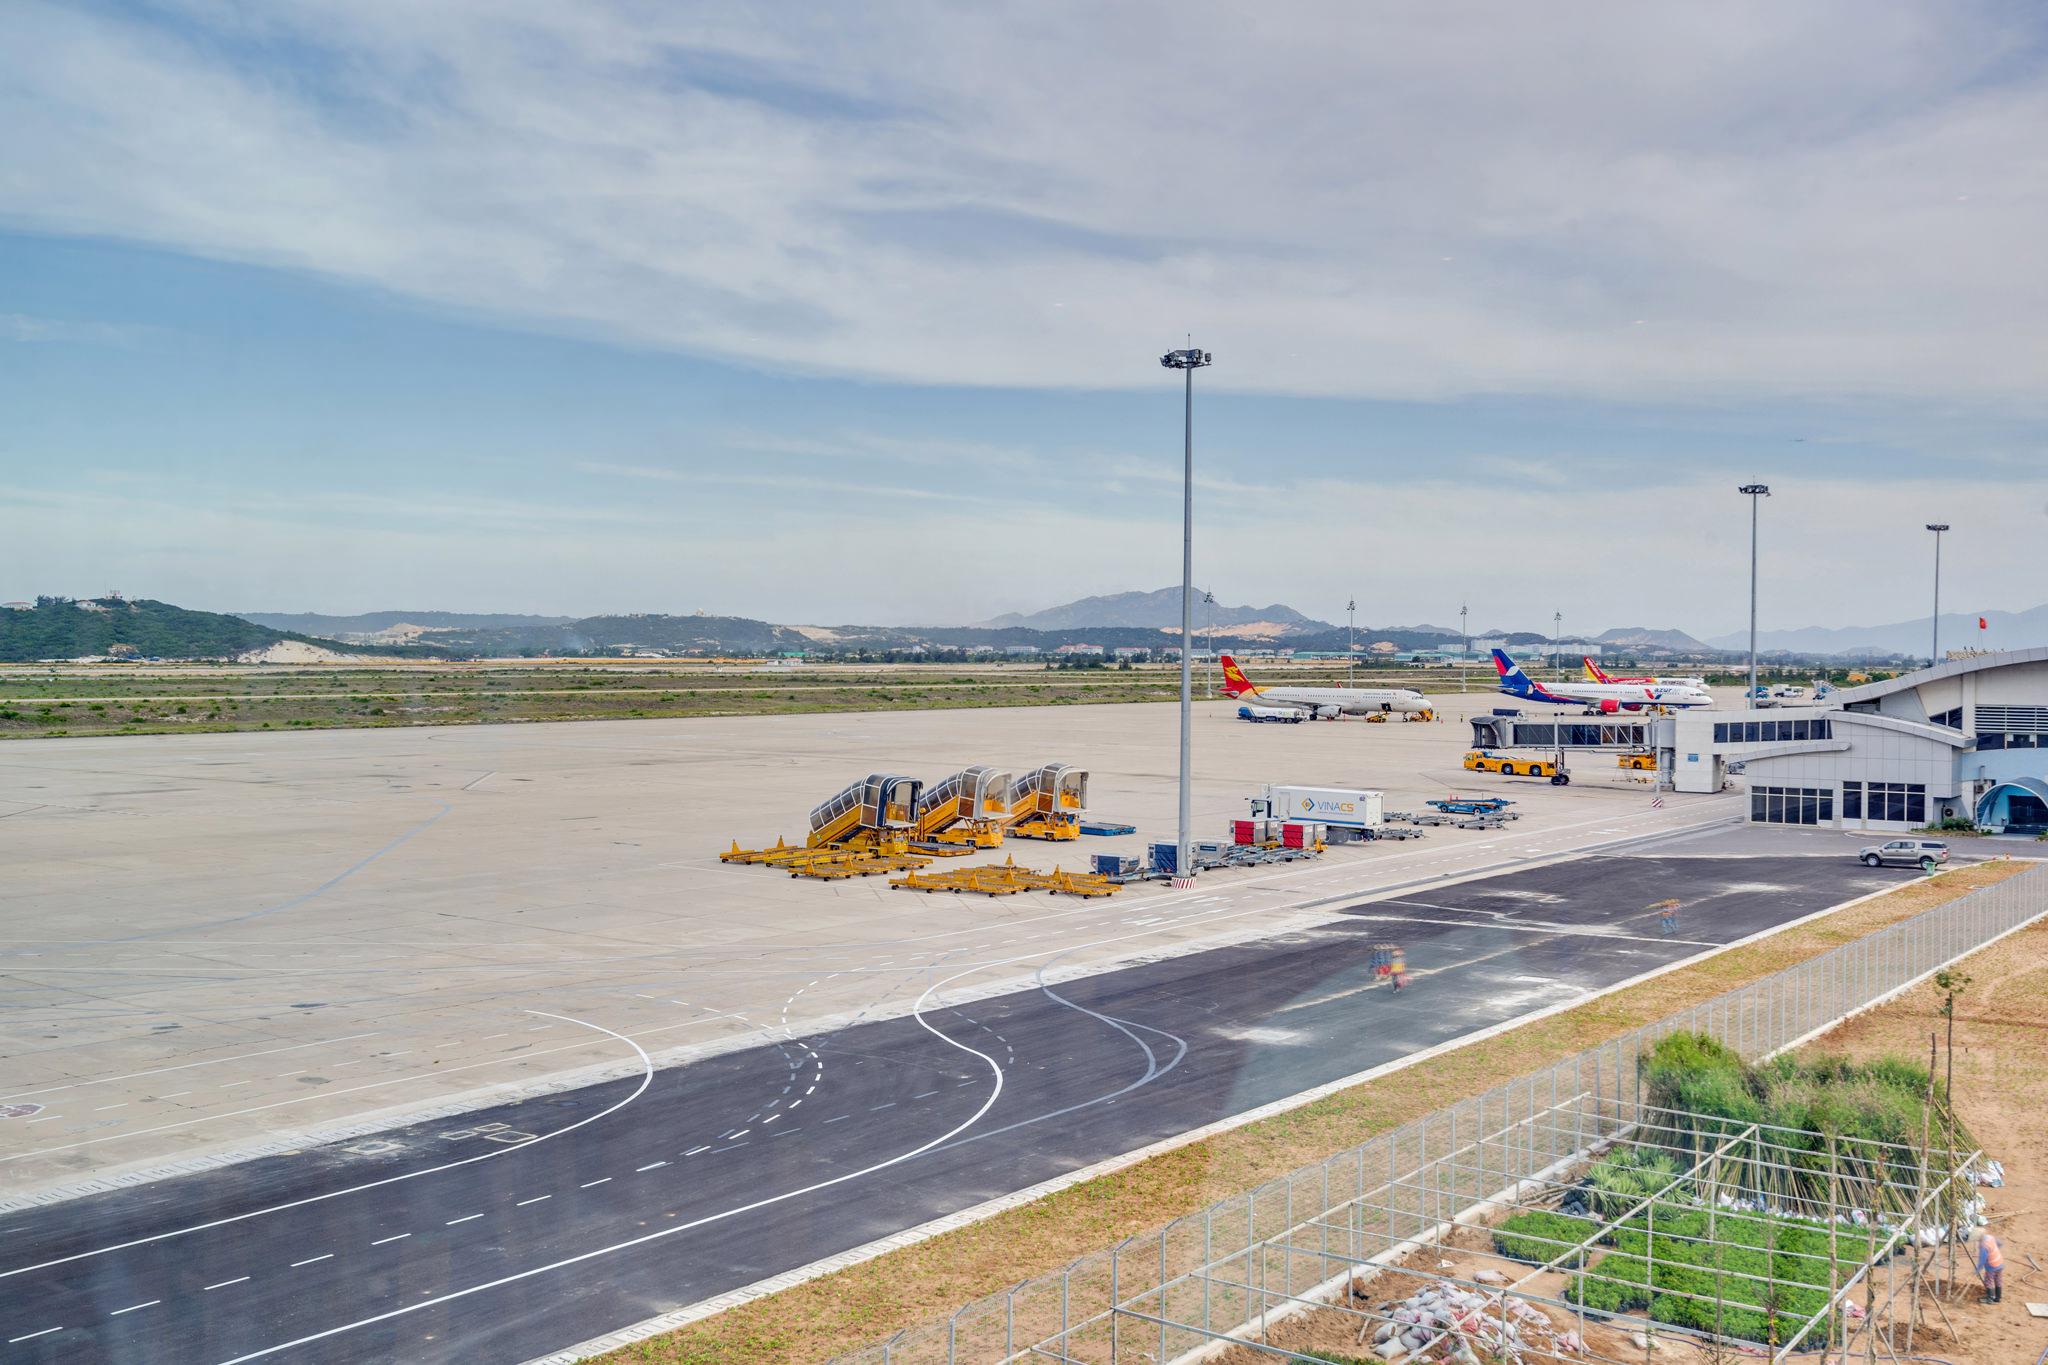 20180626 - Cam Ranh Airport - Architecture - 0348.jpg